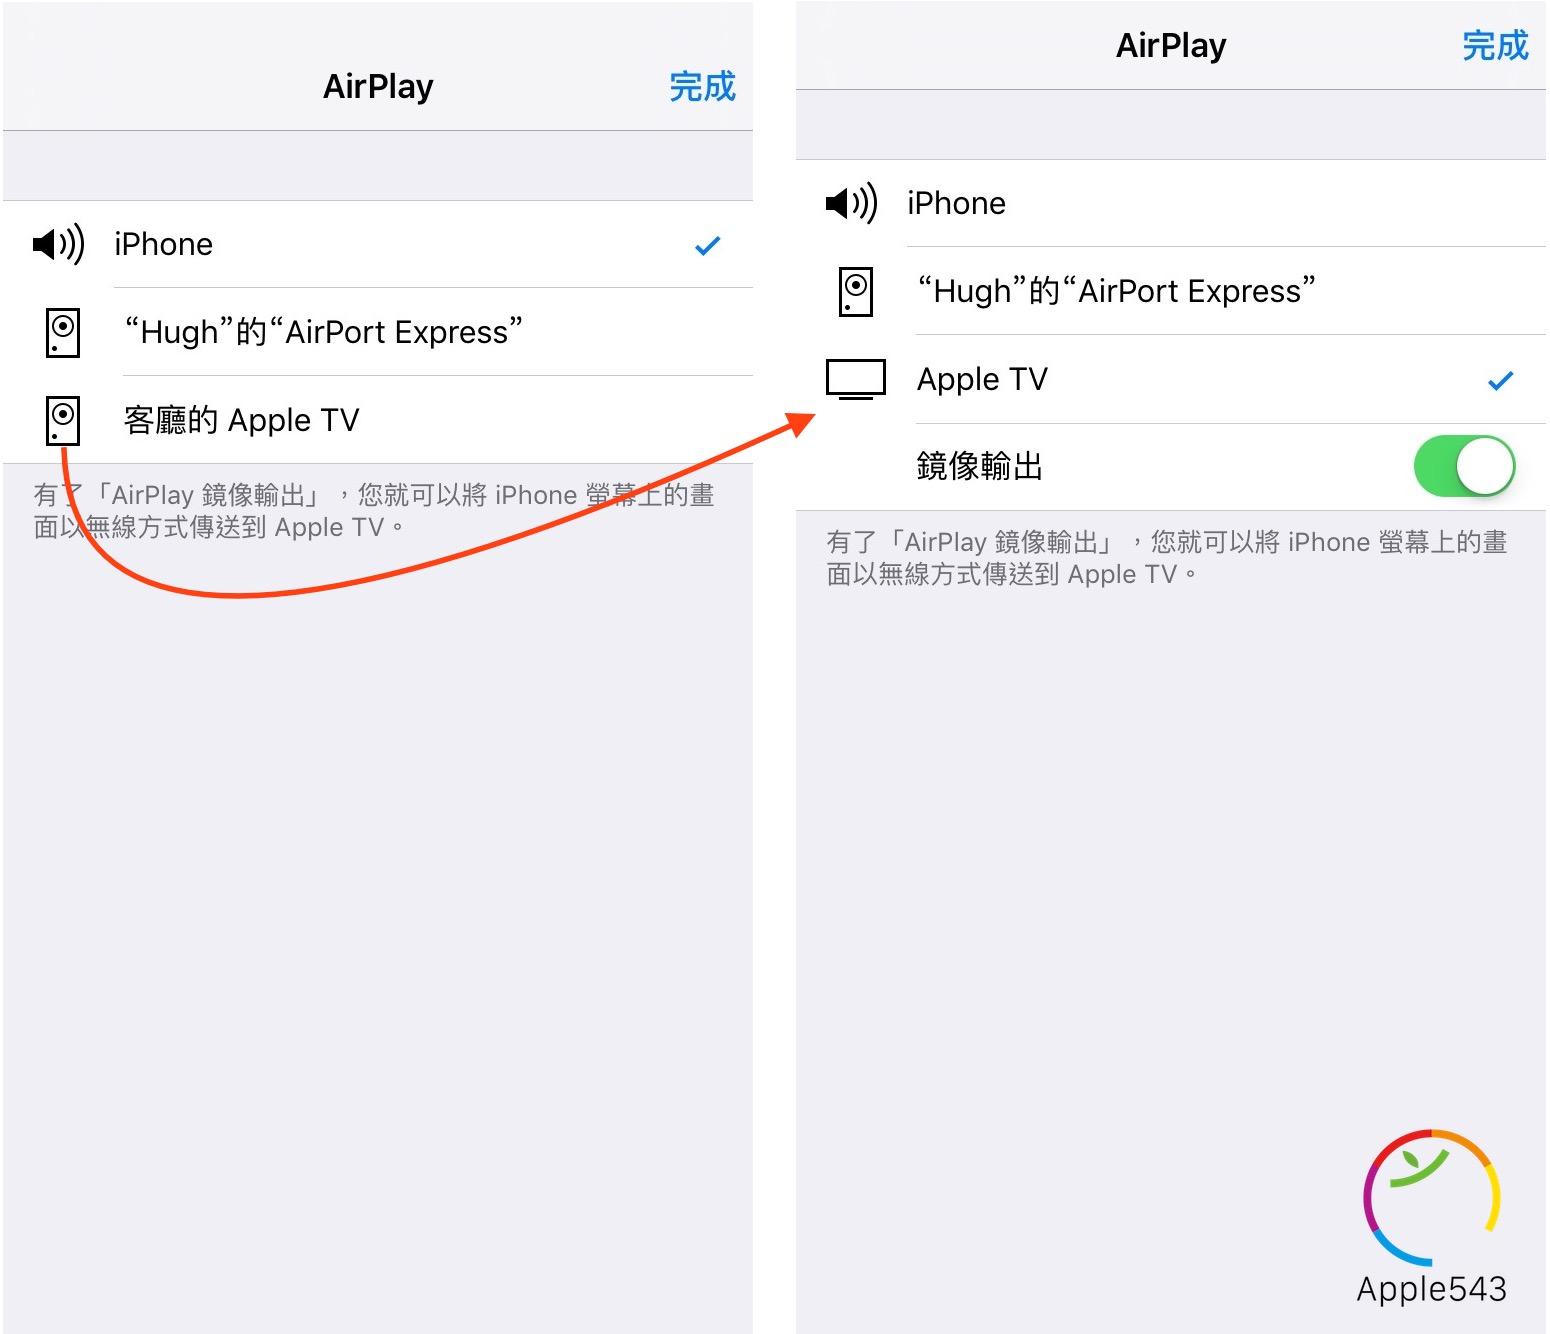 Apple TV 無法投影